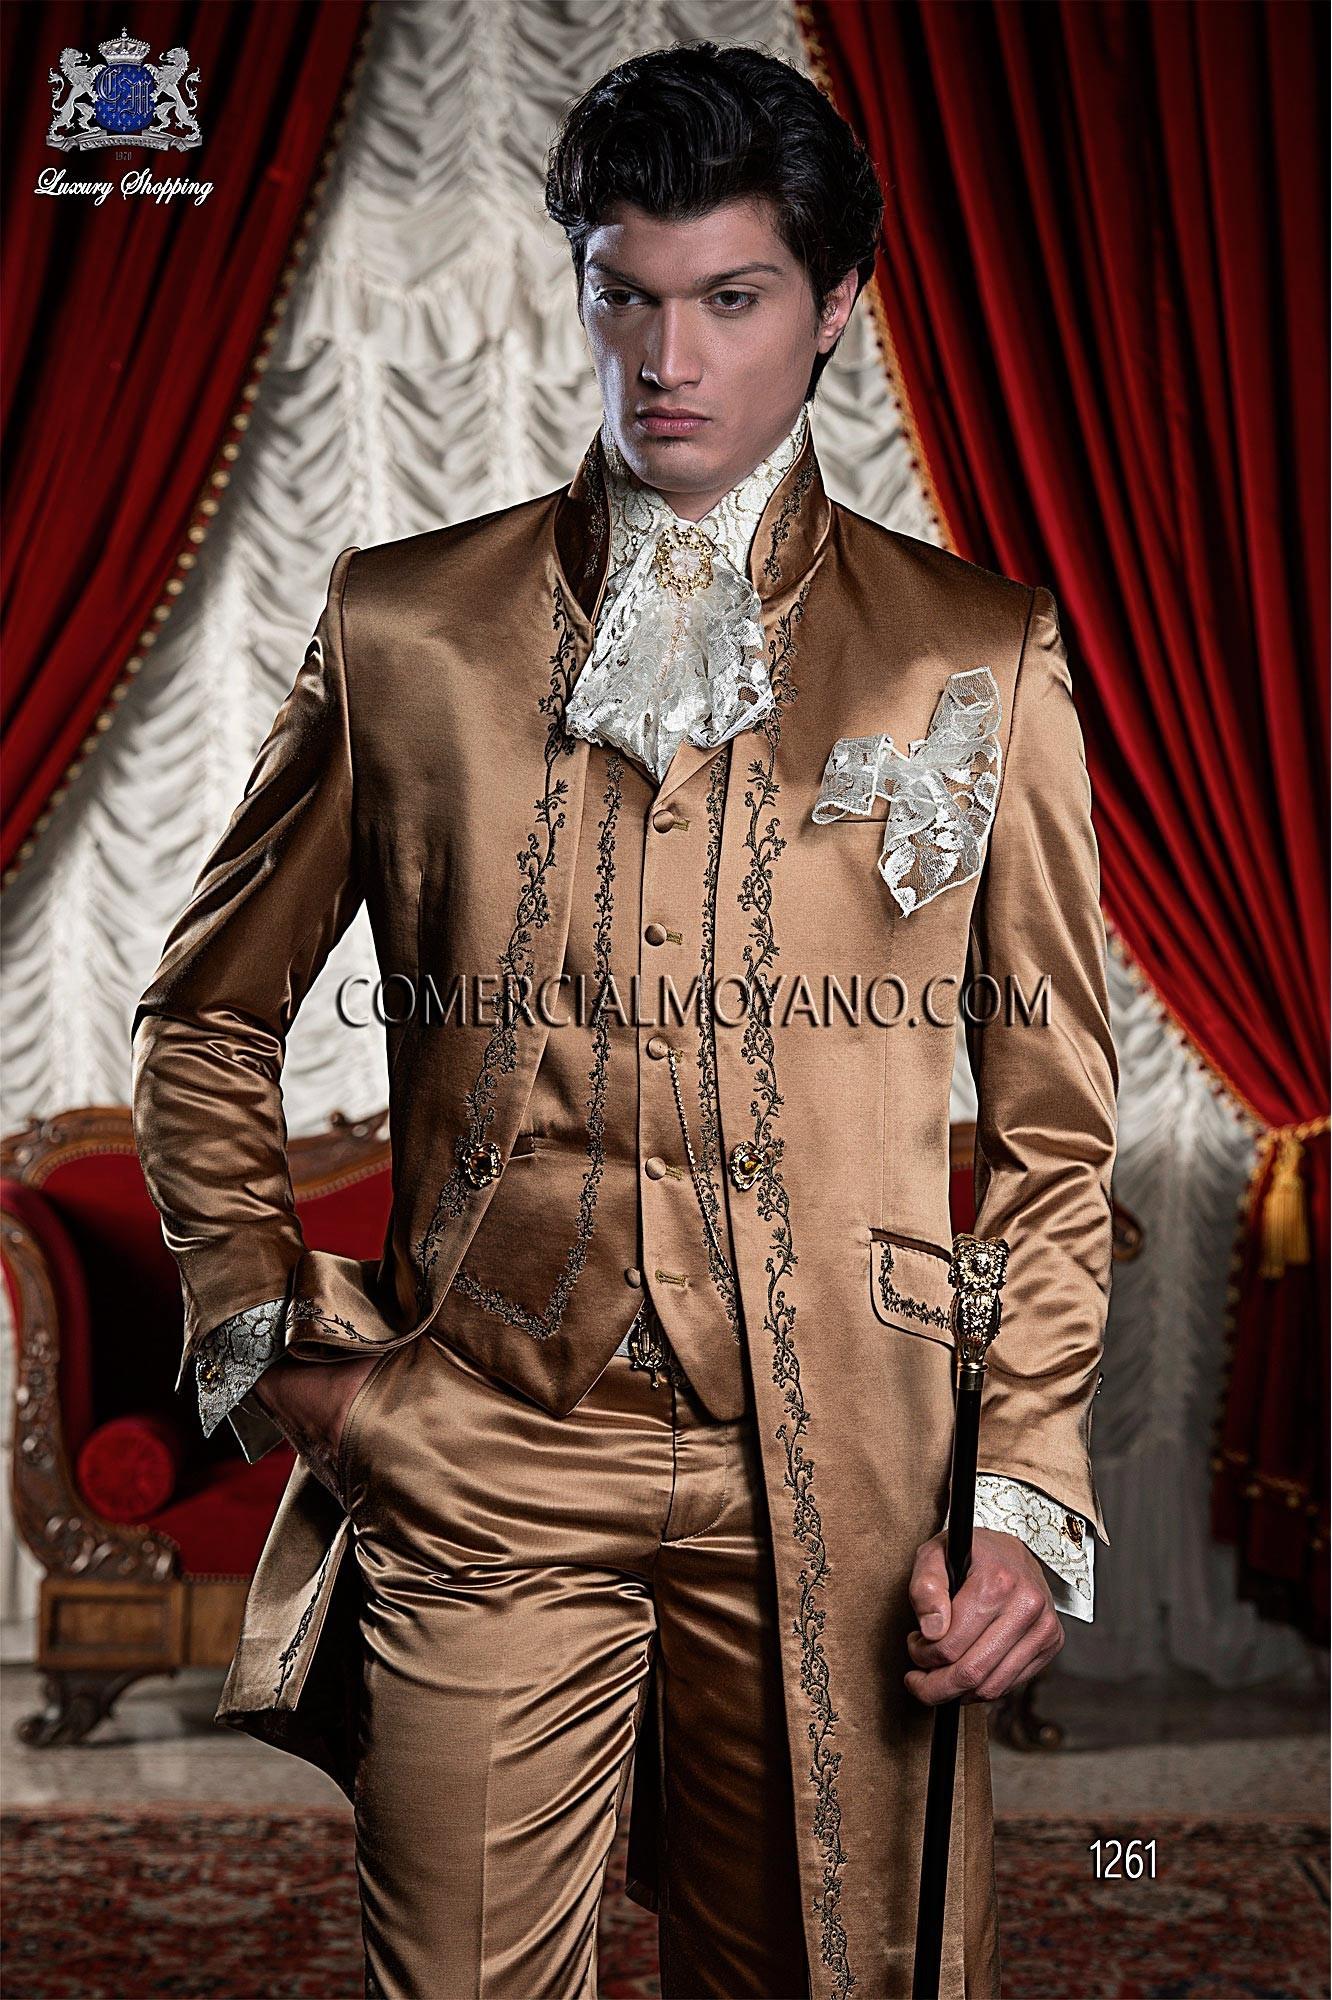 Italian bespoke dark gold wedding suit style 1261 Ottavio Nuccio Gala.